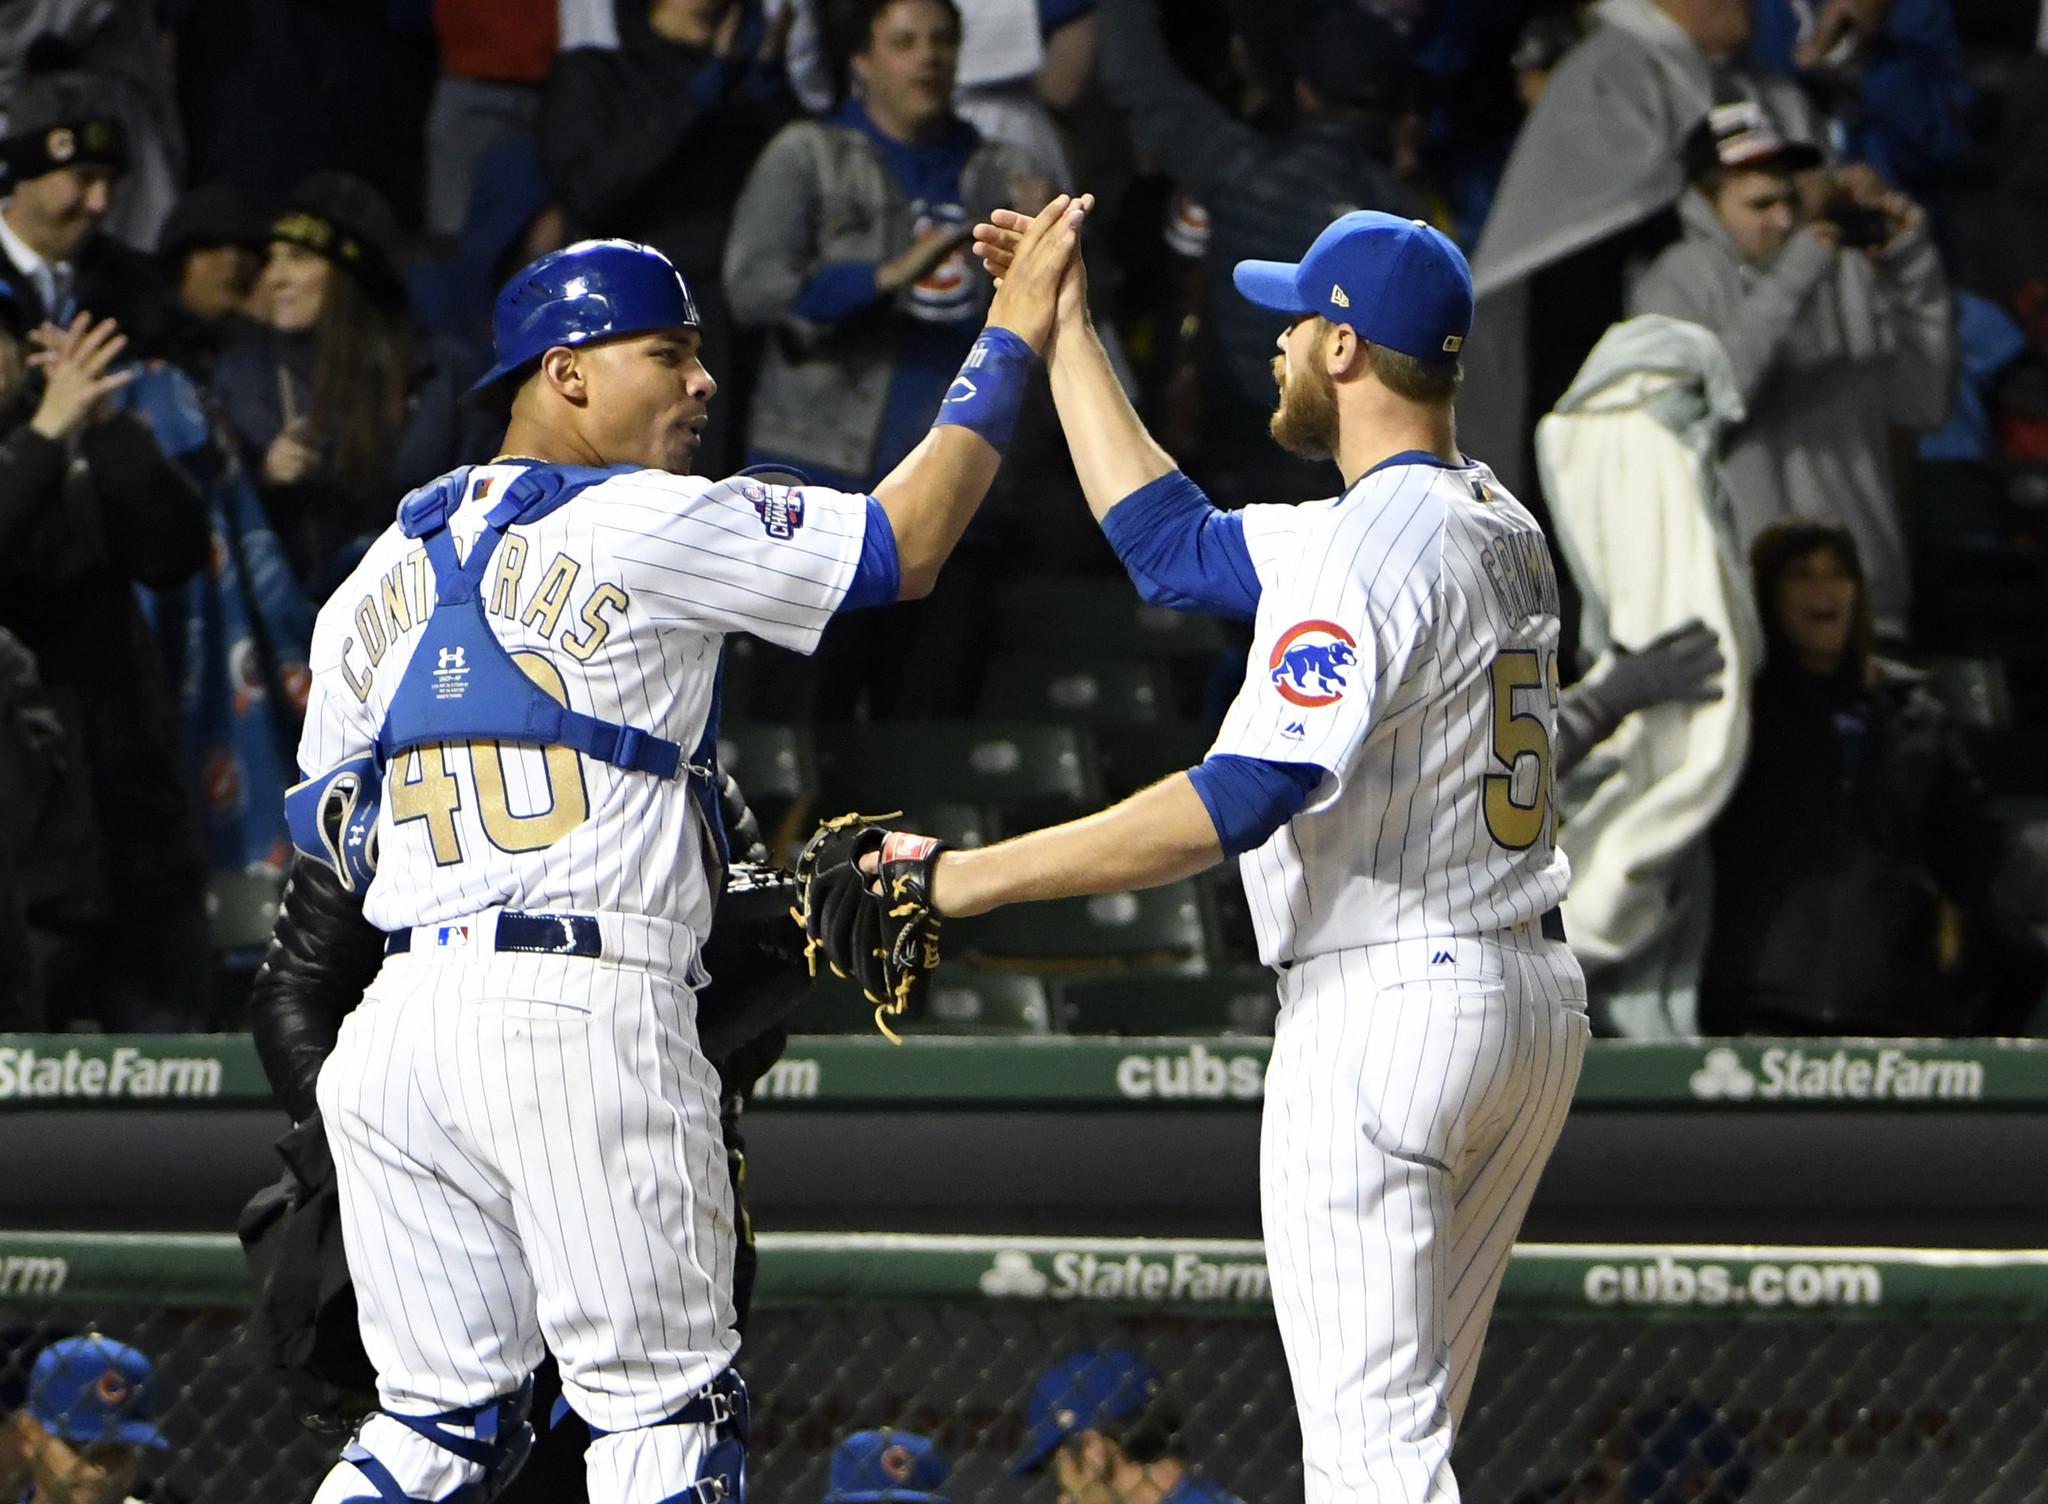 Wallpaper Chicago Cubs Cubs Major League Baseball